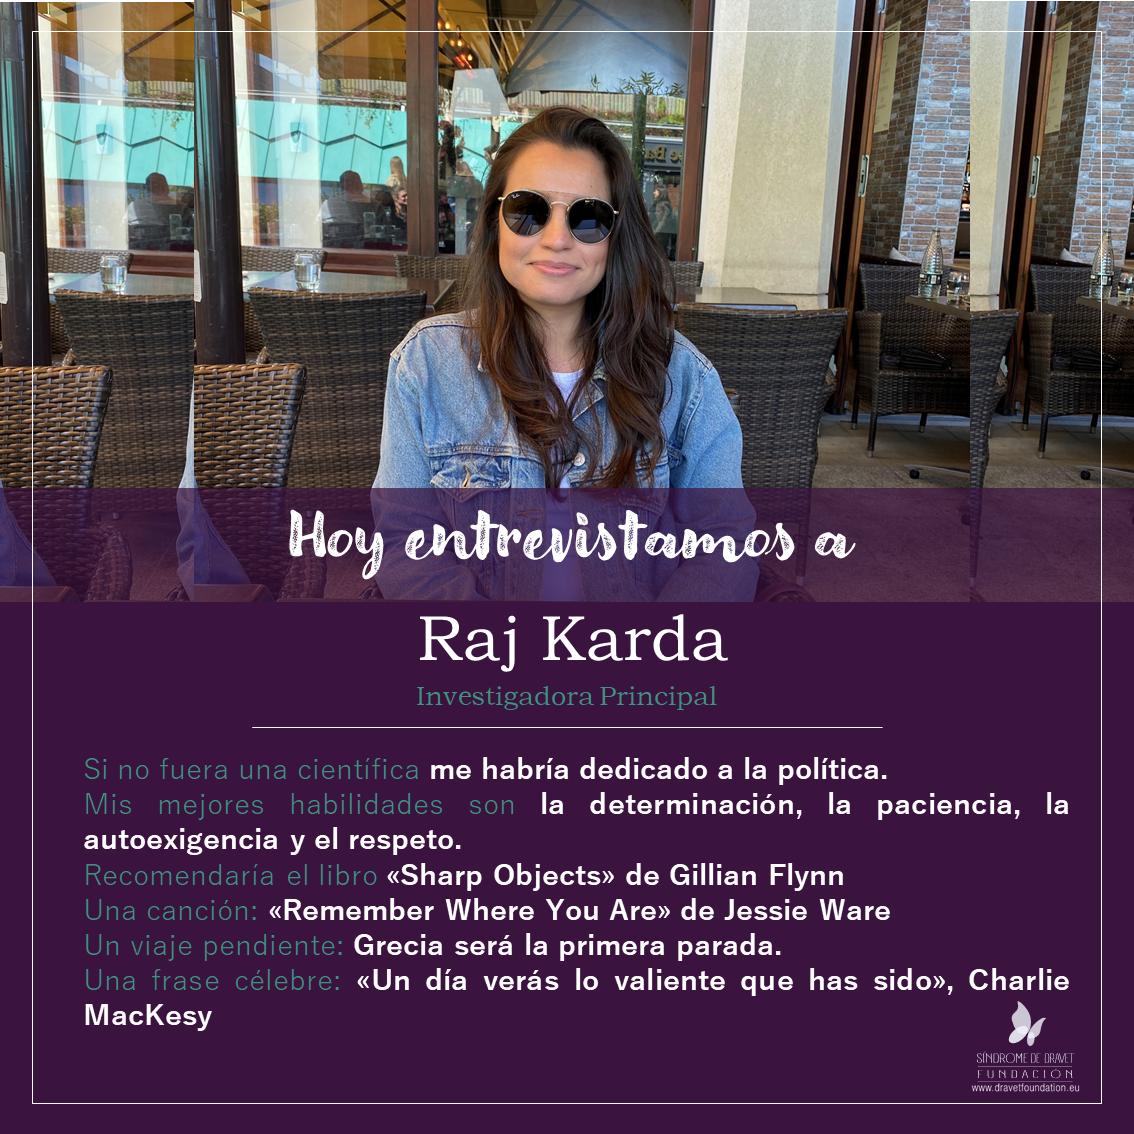 Entrevistamos a Raj Karda